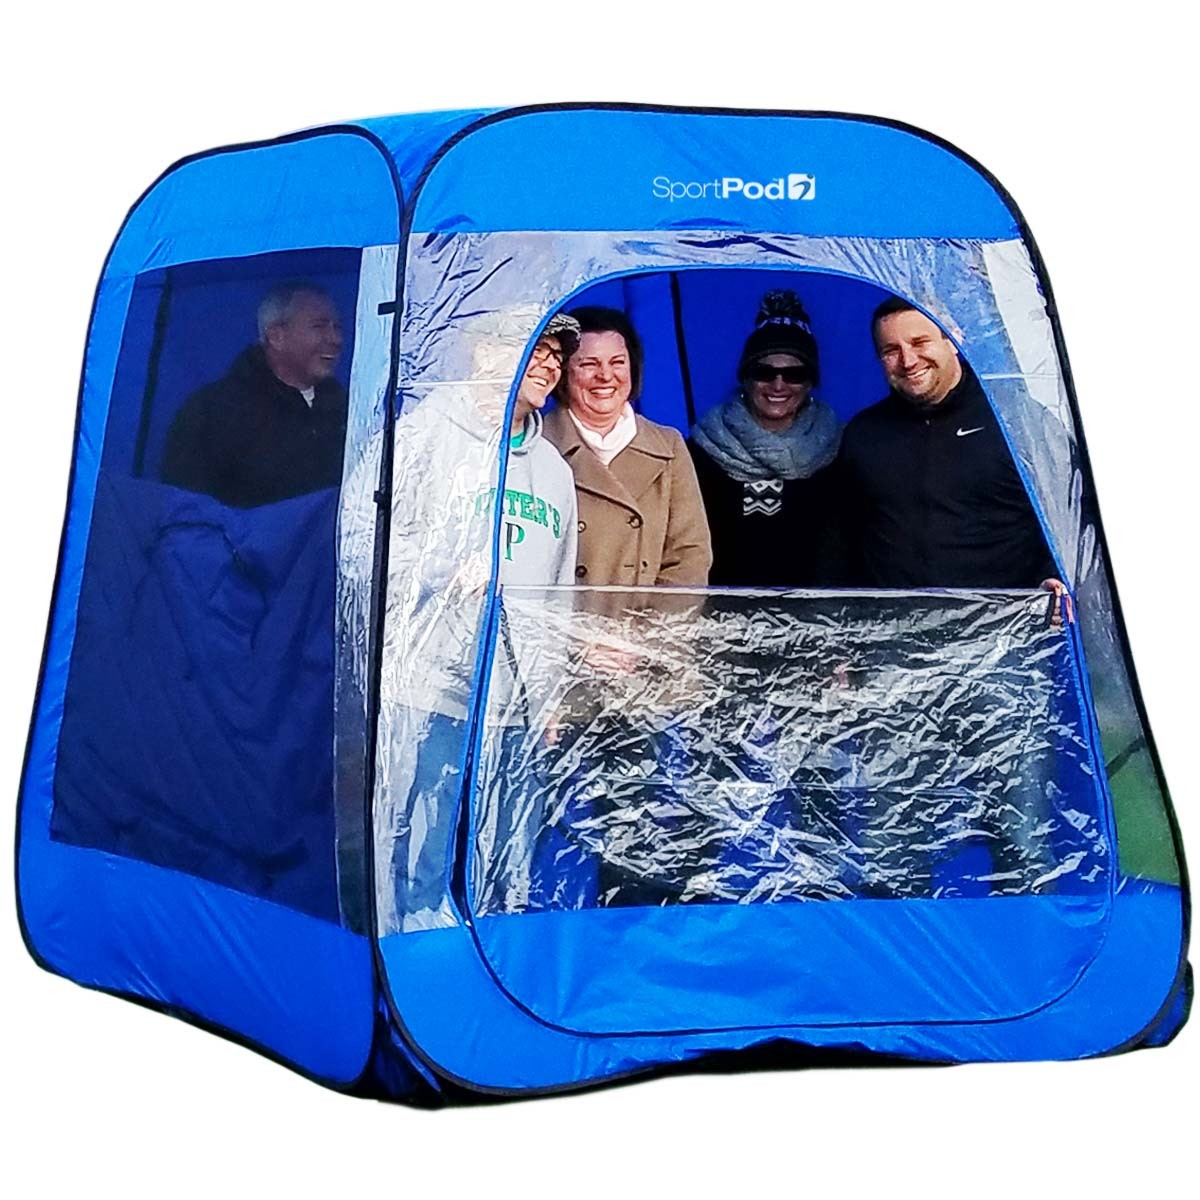 Teampod All Weather Sportpod Pop Up Chair Tent